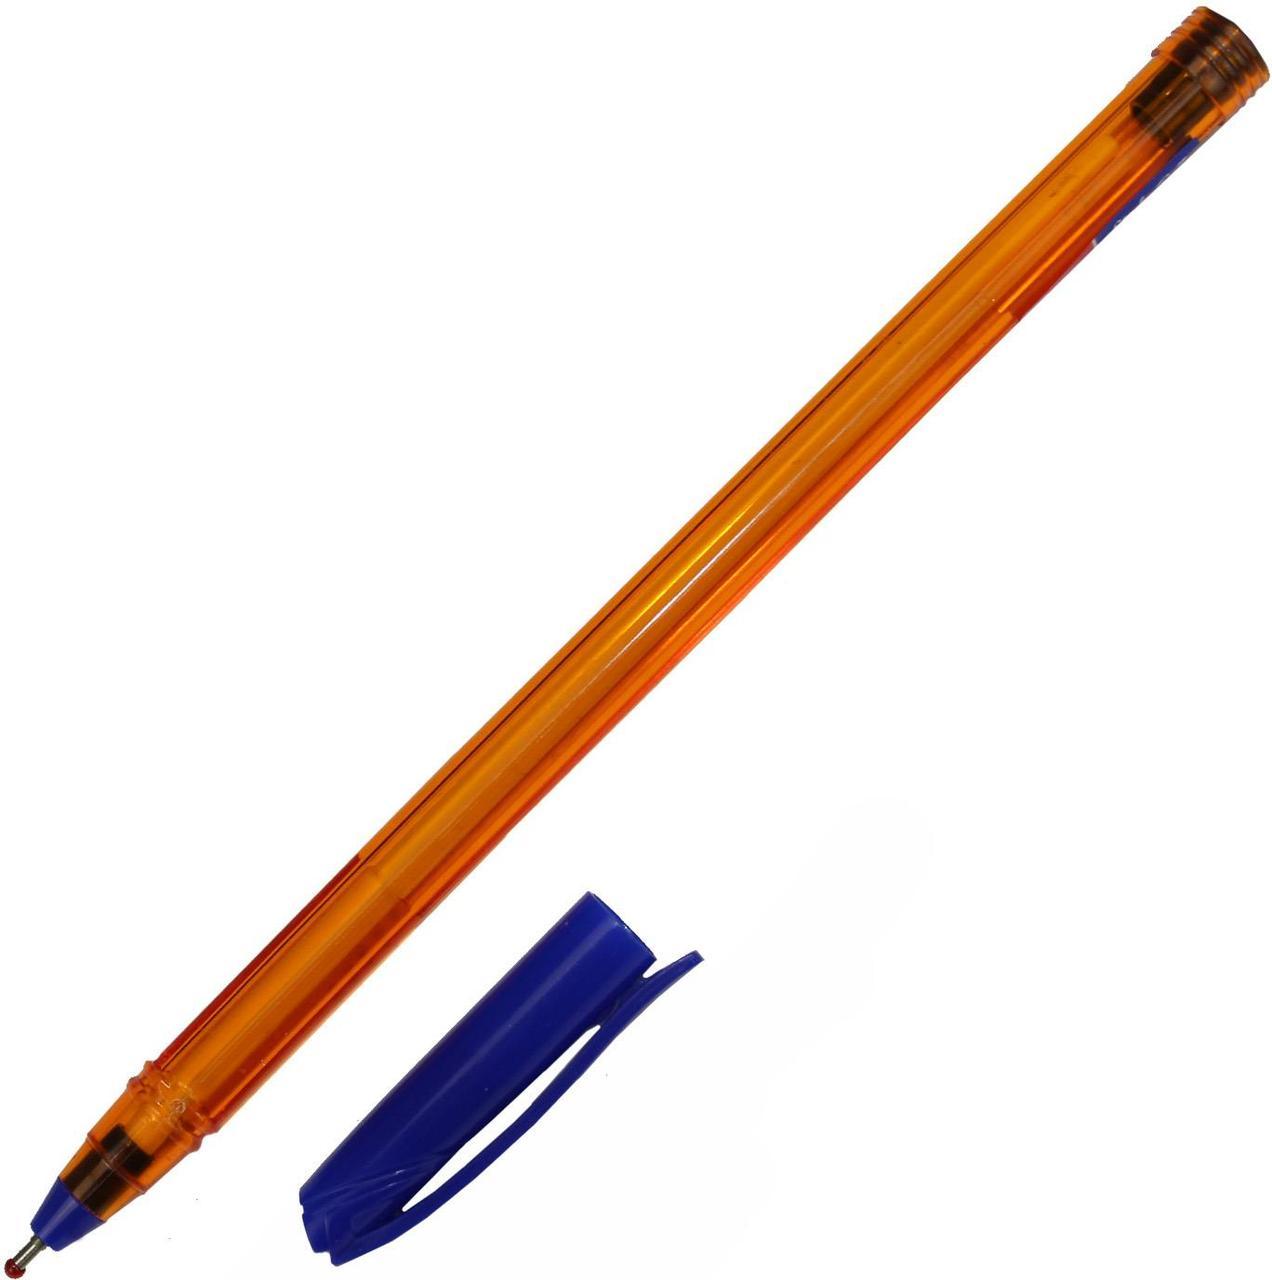 Ручка шариковая 1,0 мм, синяя, Style G7, Unimax, UX-101-02, 36580